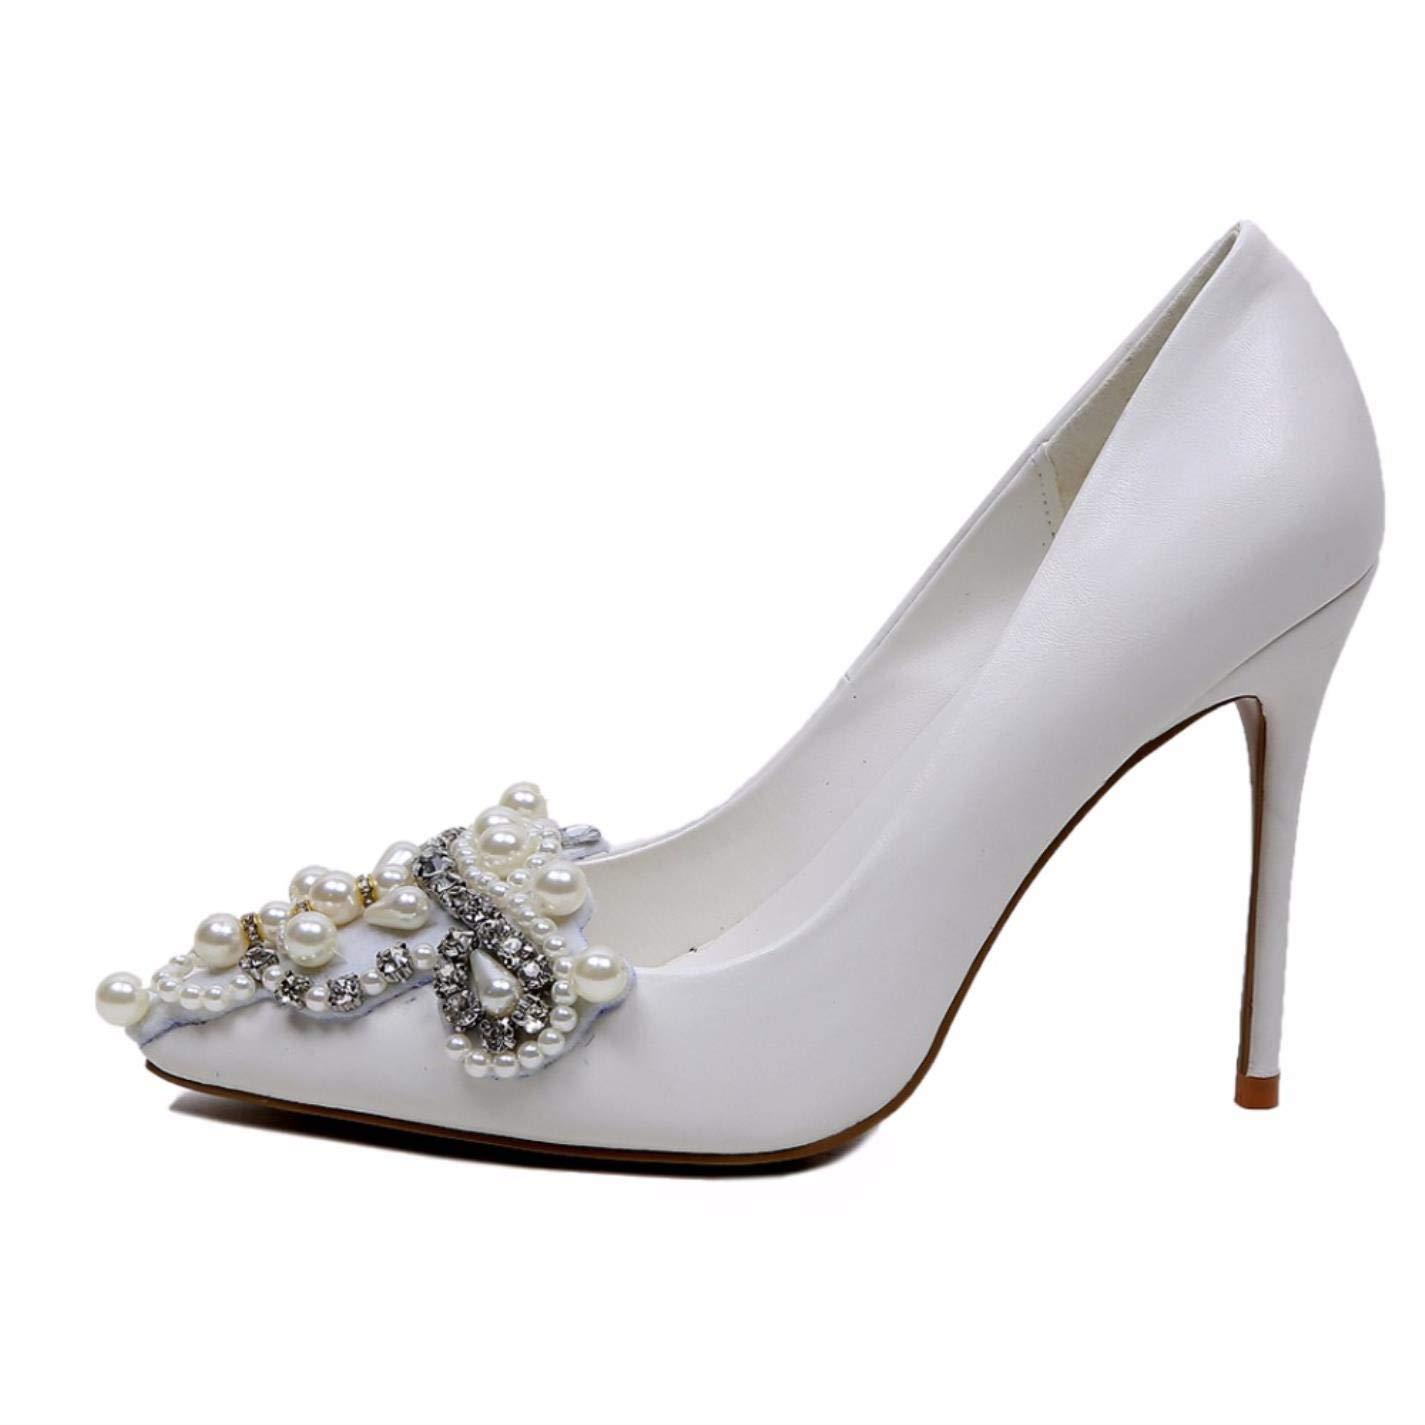 c01f736daefd0 Amazon.com: Pearl White Wedding Shoes For Women High Heels Stiletto ...